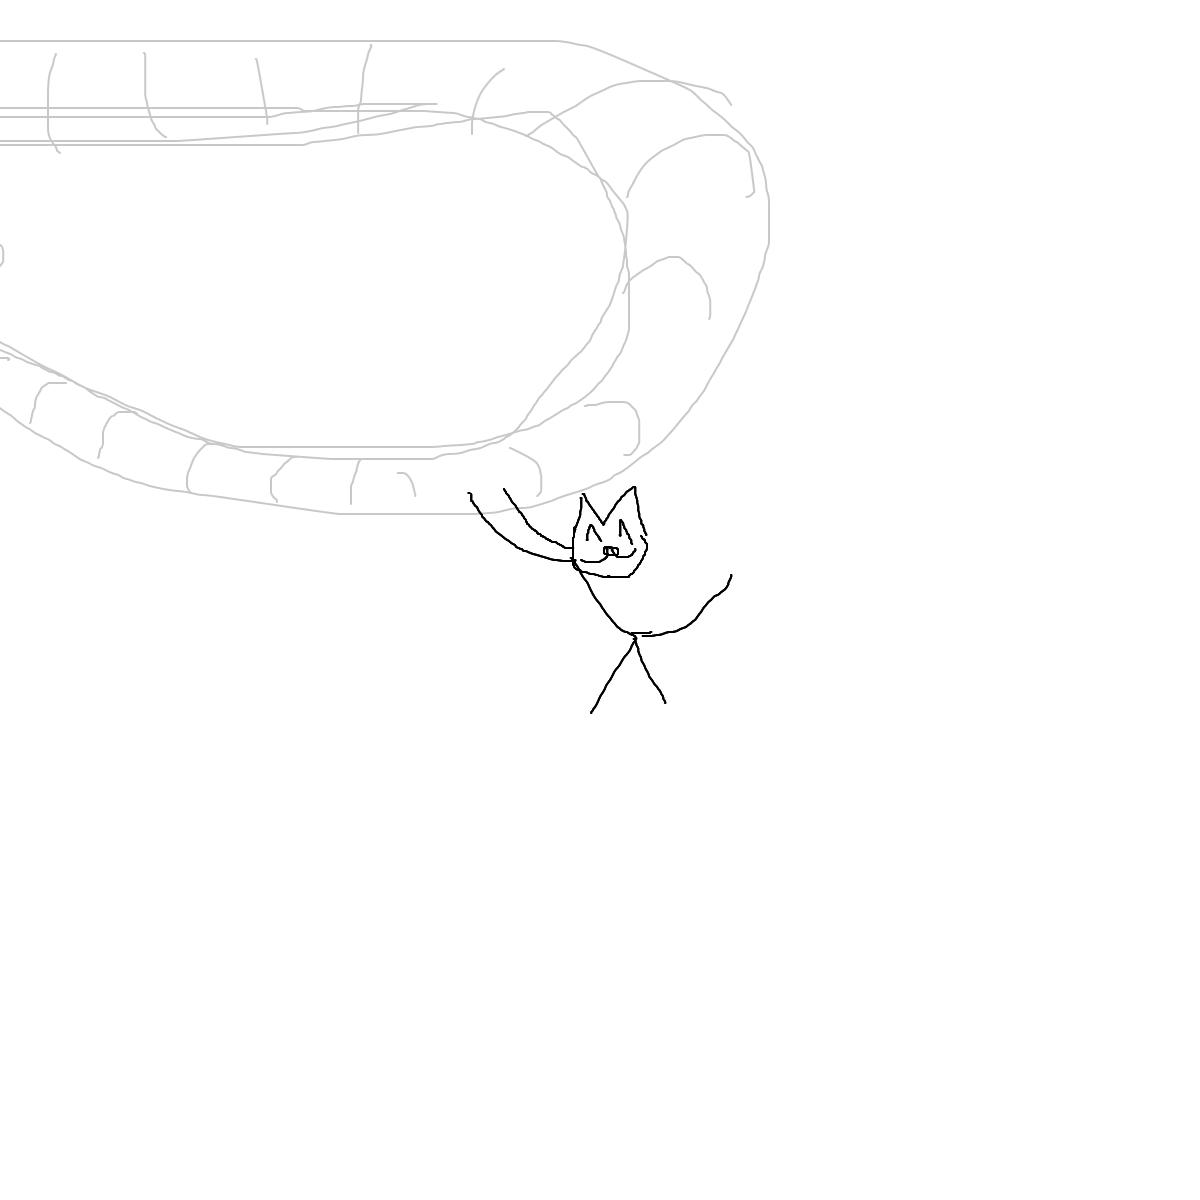 BAAAM drawing#11560 lat:52.4750518798828100lng: 13.4082202911376950